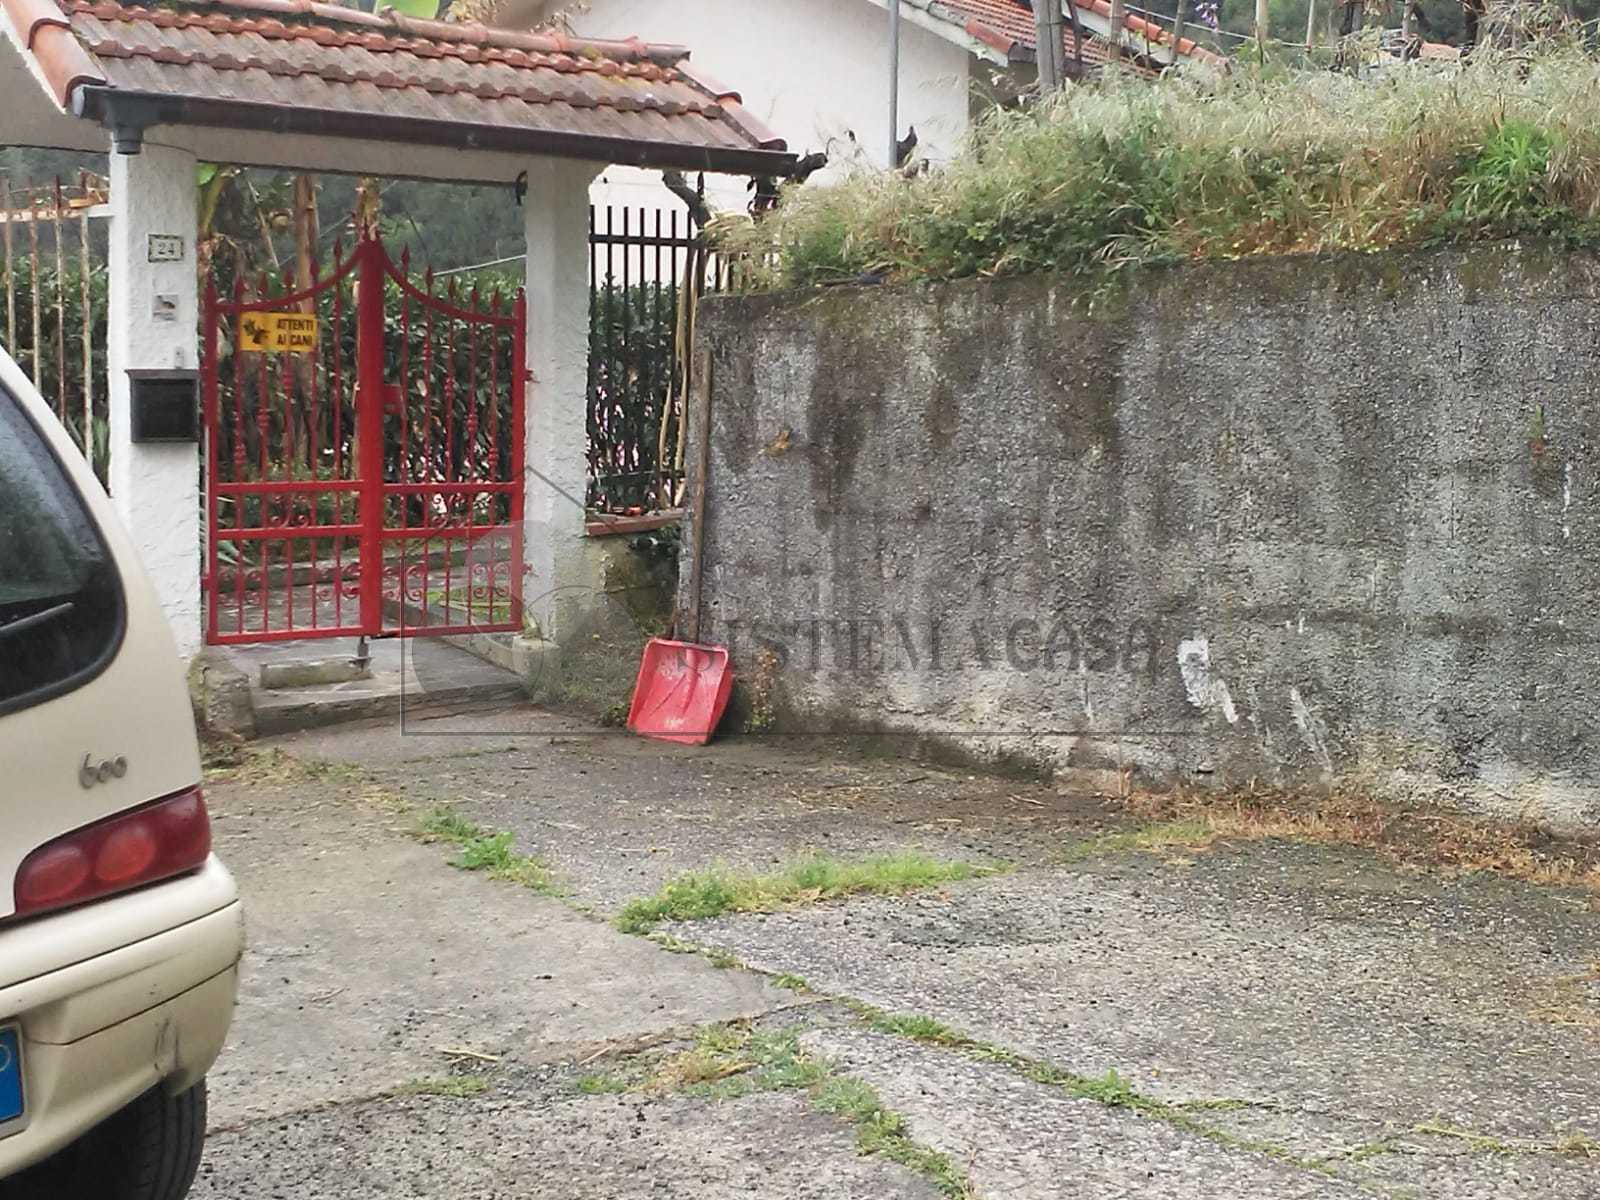 Vendita Indipendente Singola a Follo, Carnea (SP) - F248